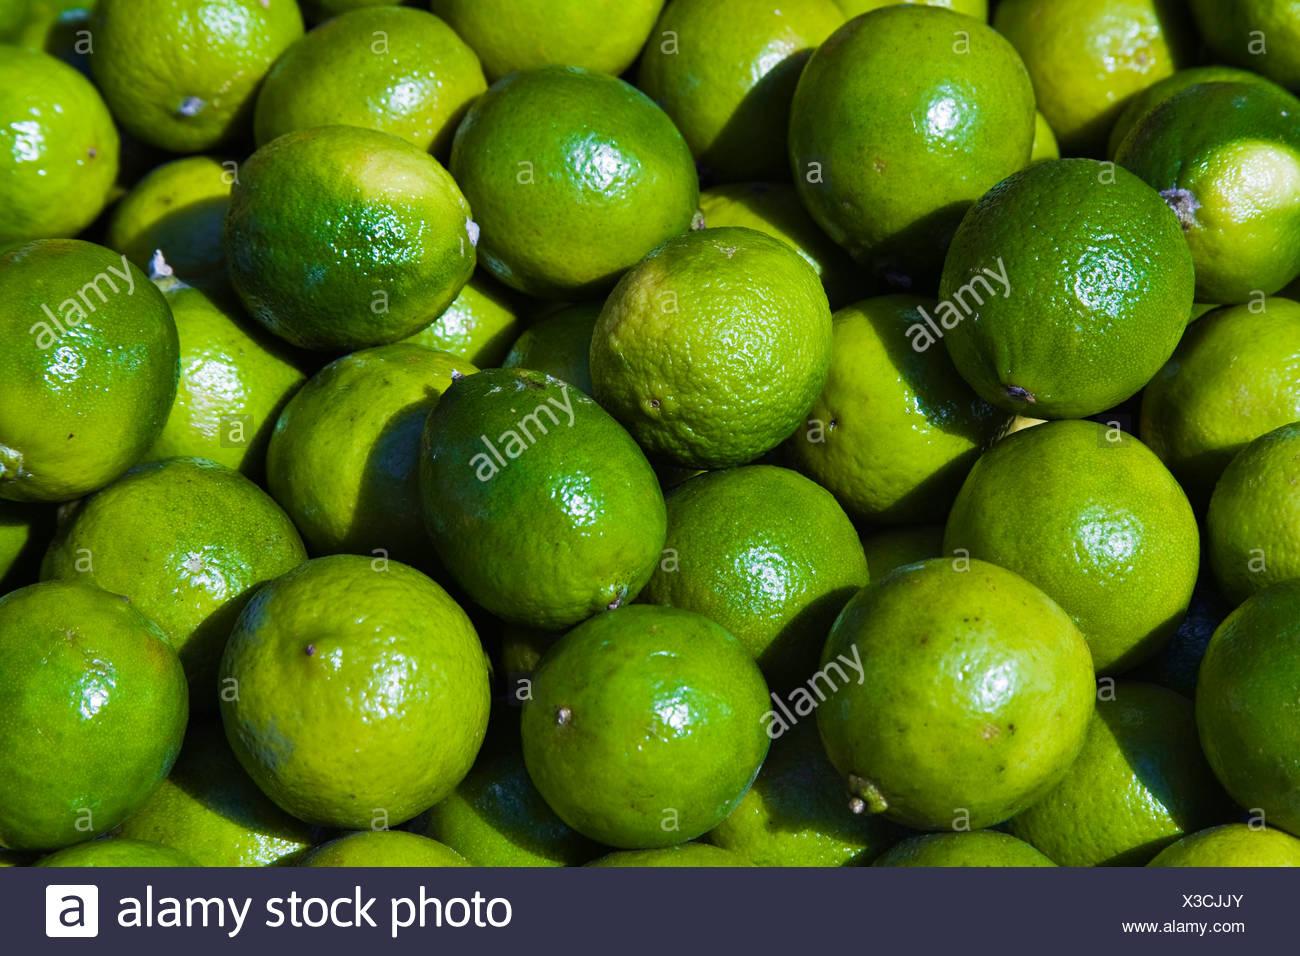 Limes (Citrus × aurantiifolia) Stock Photo